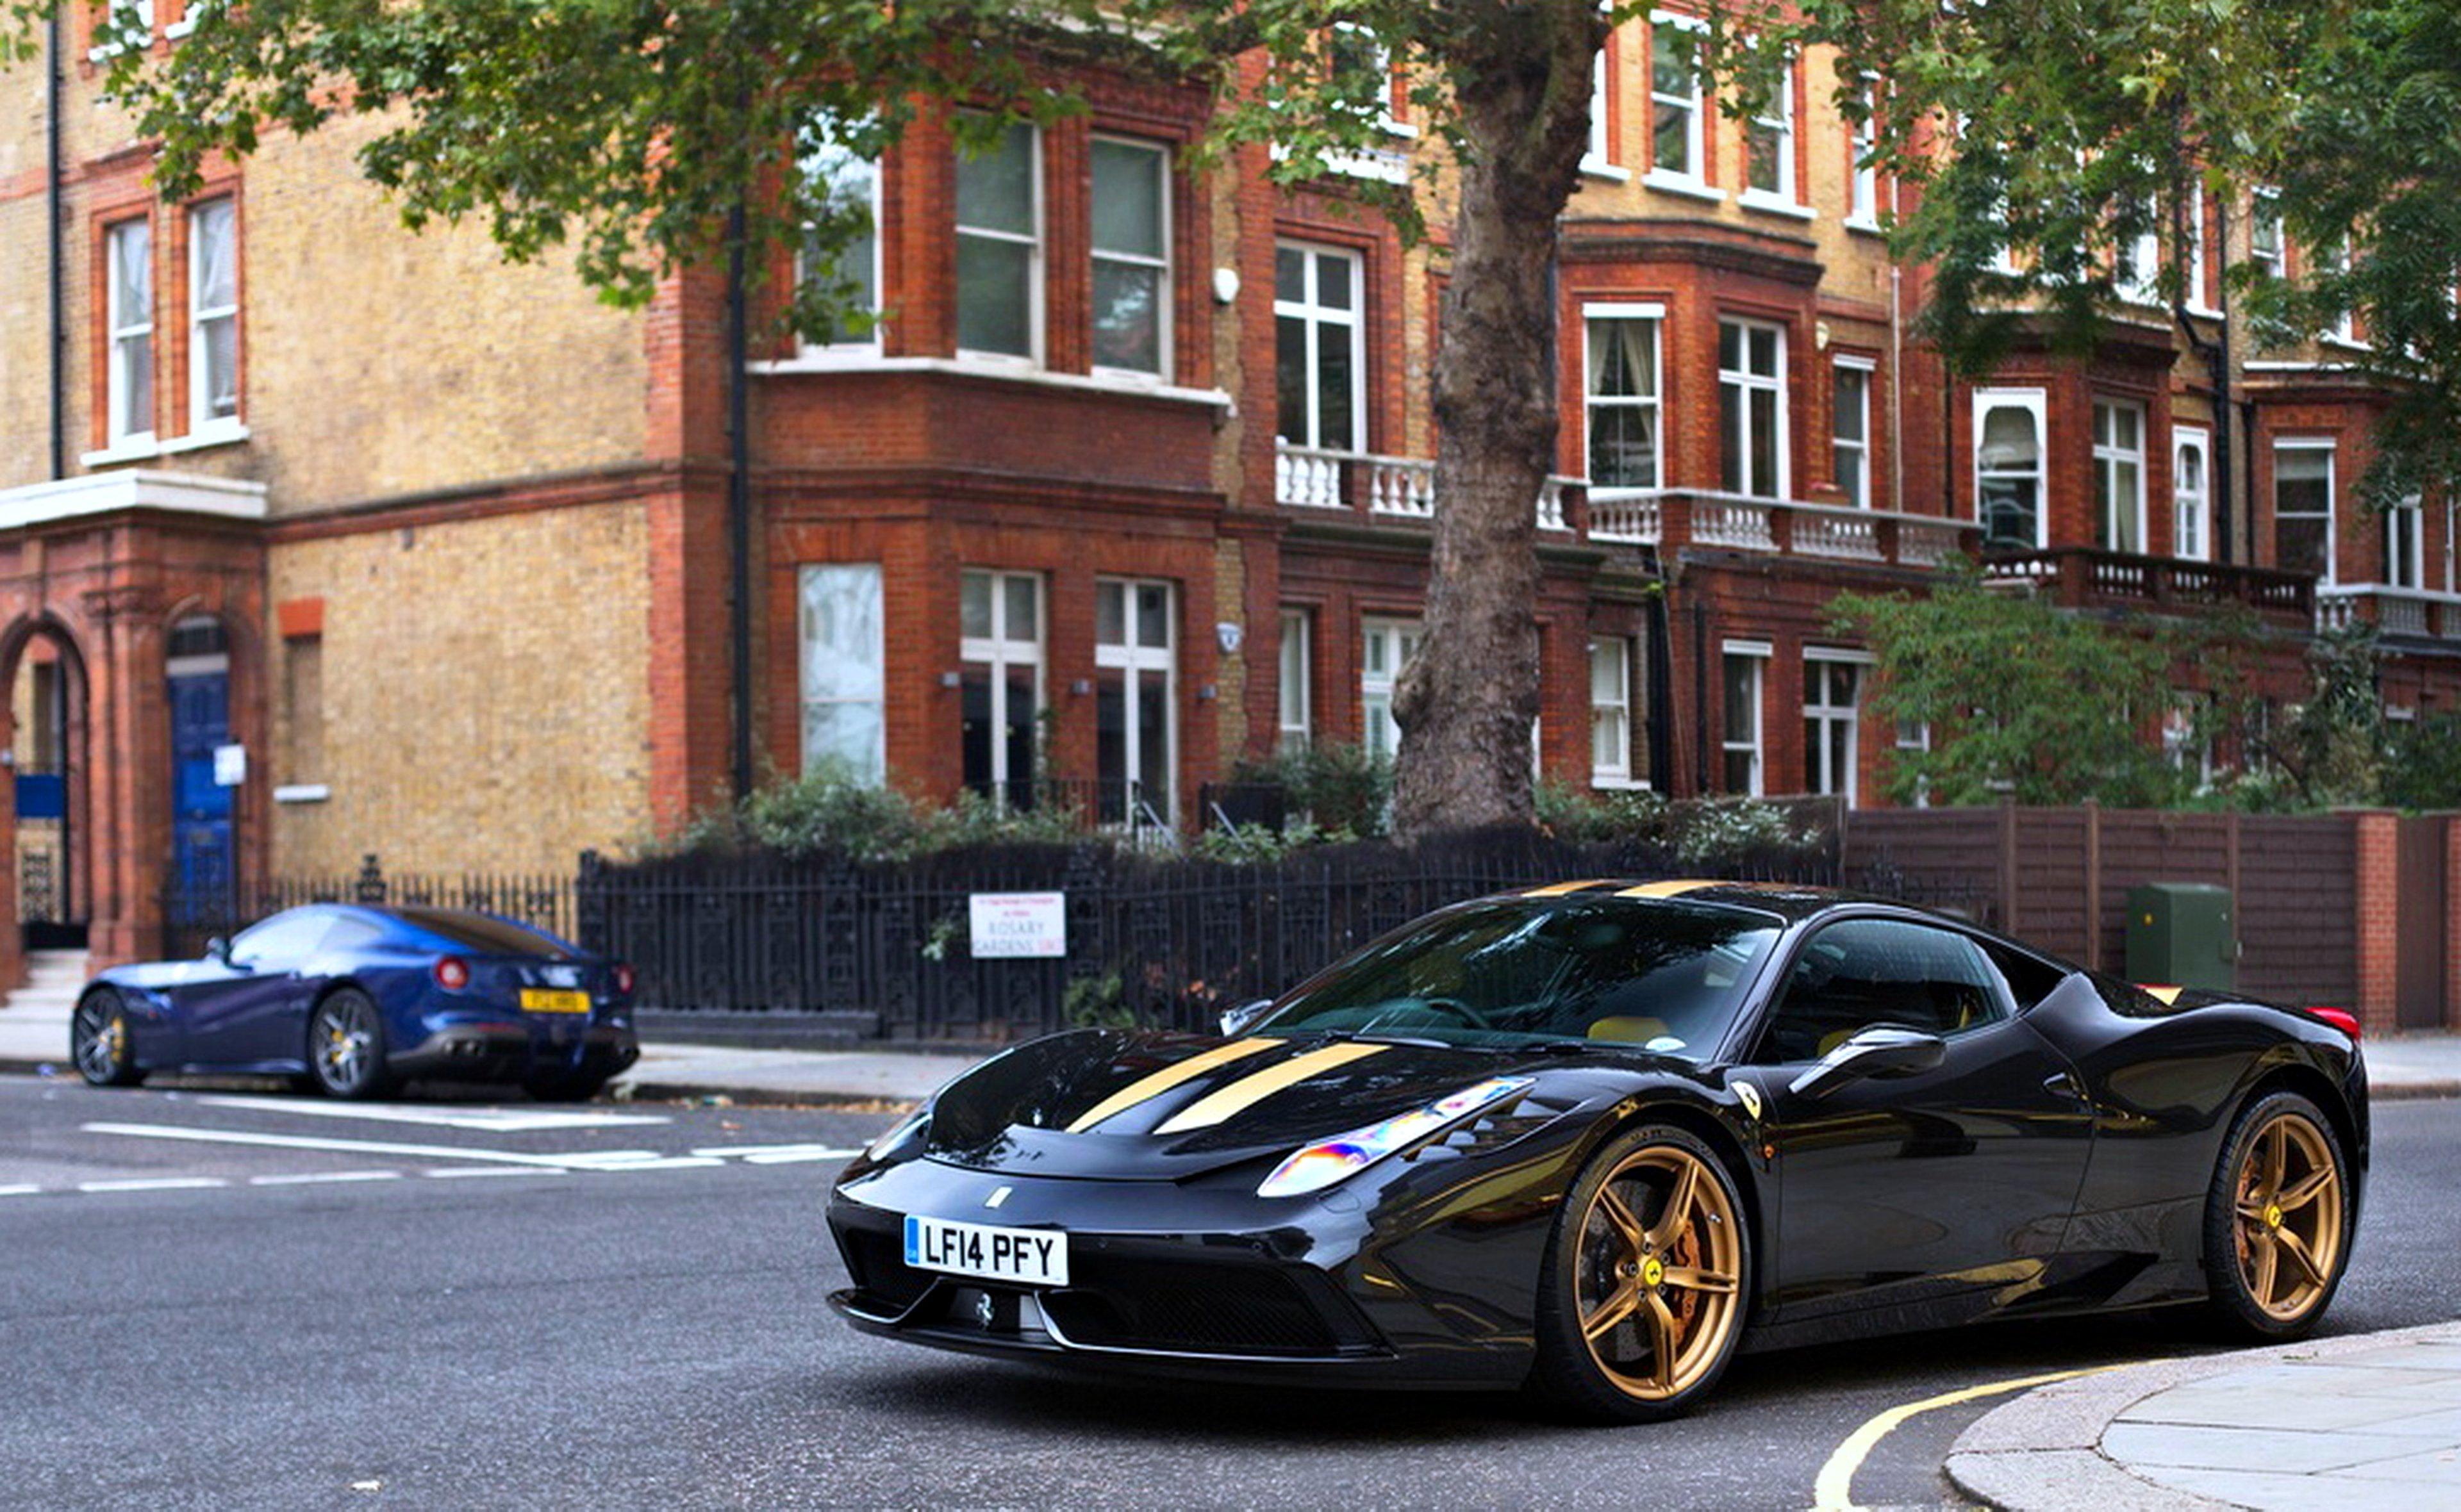 Ferrari Avto Black City Cars Supercars Road Town Speed Motors